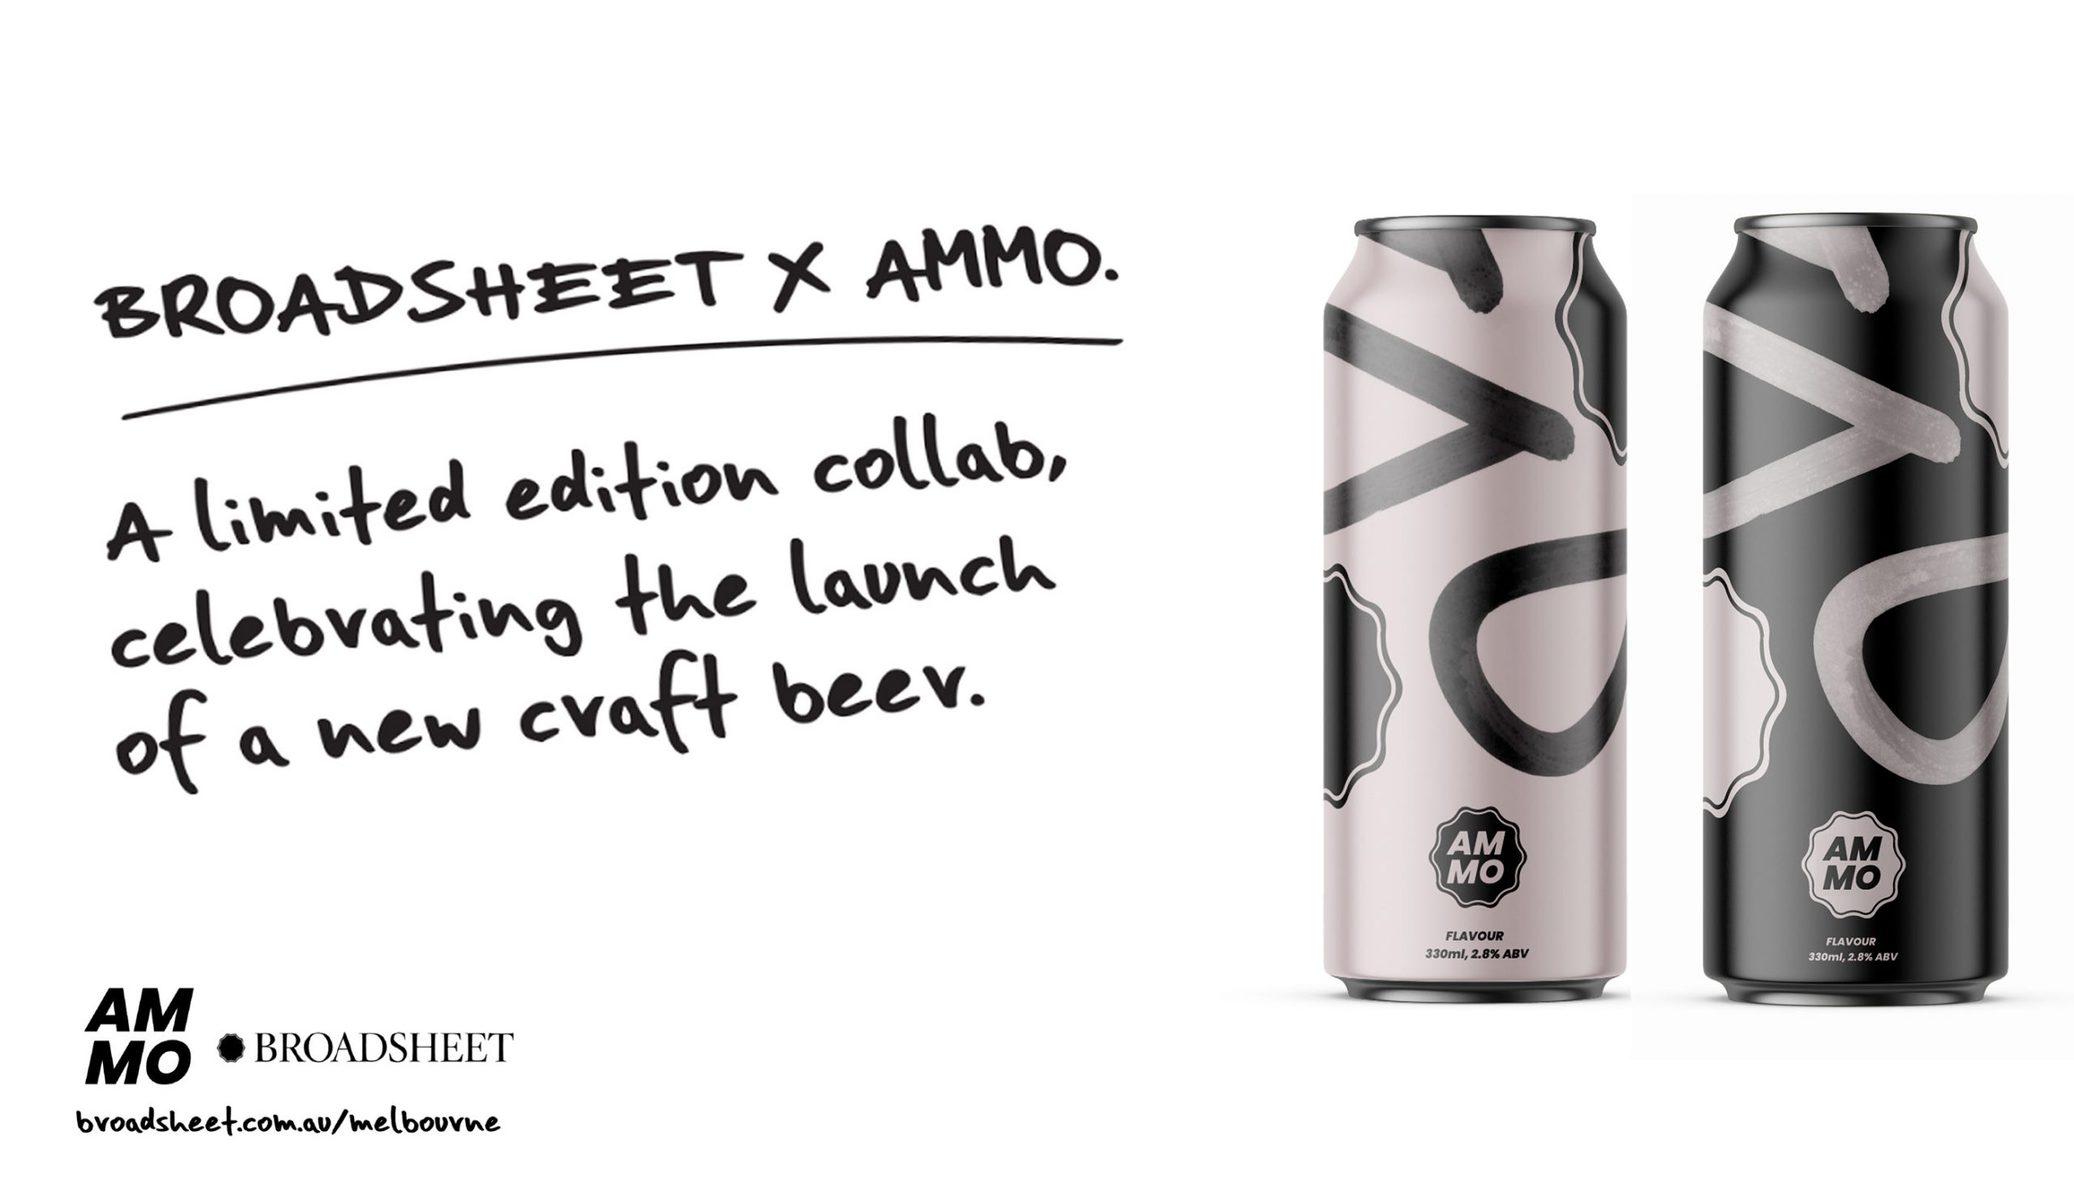 Ammo精酿啤酒包装设计